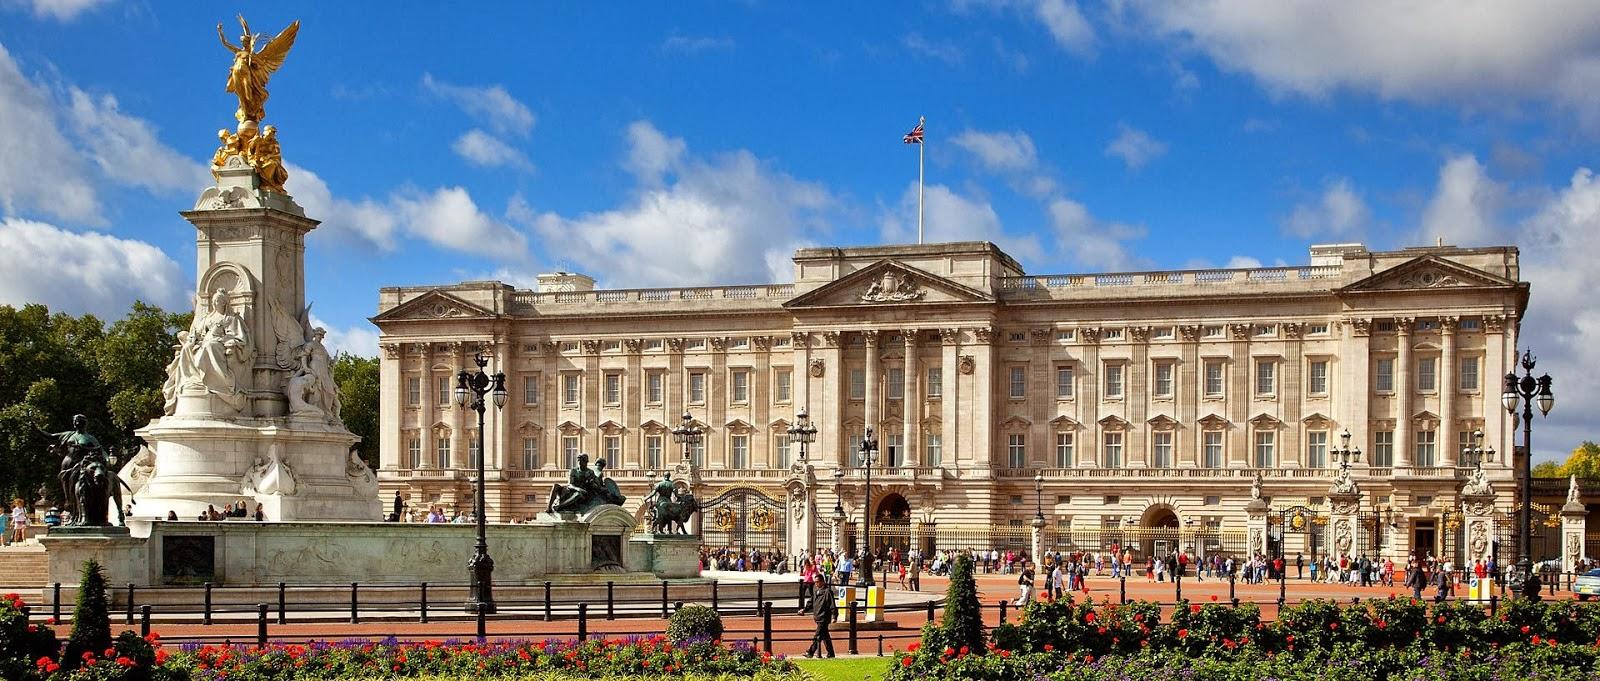 Svirgolettate le 10 citt europee che consiglio di - Buckingham palace interno ...